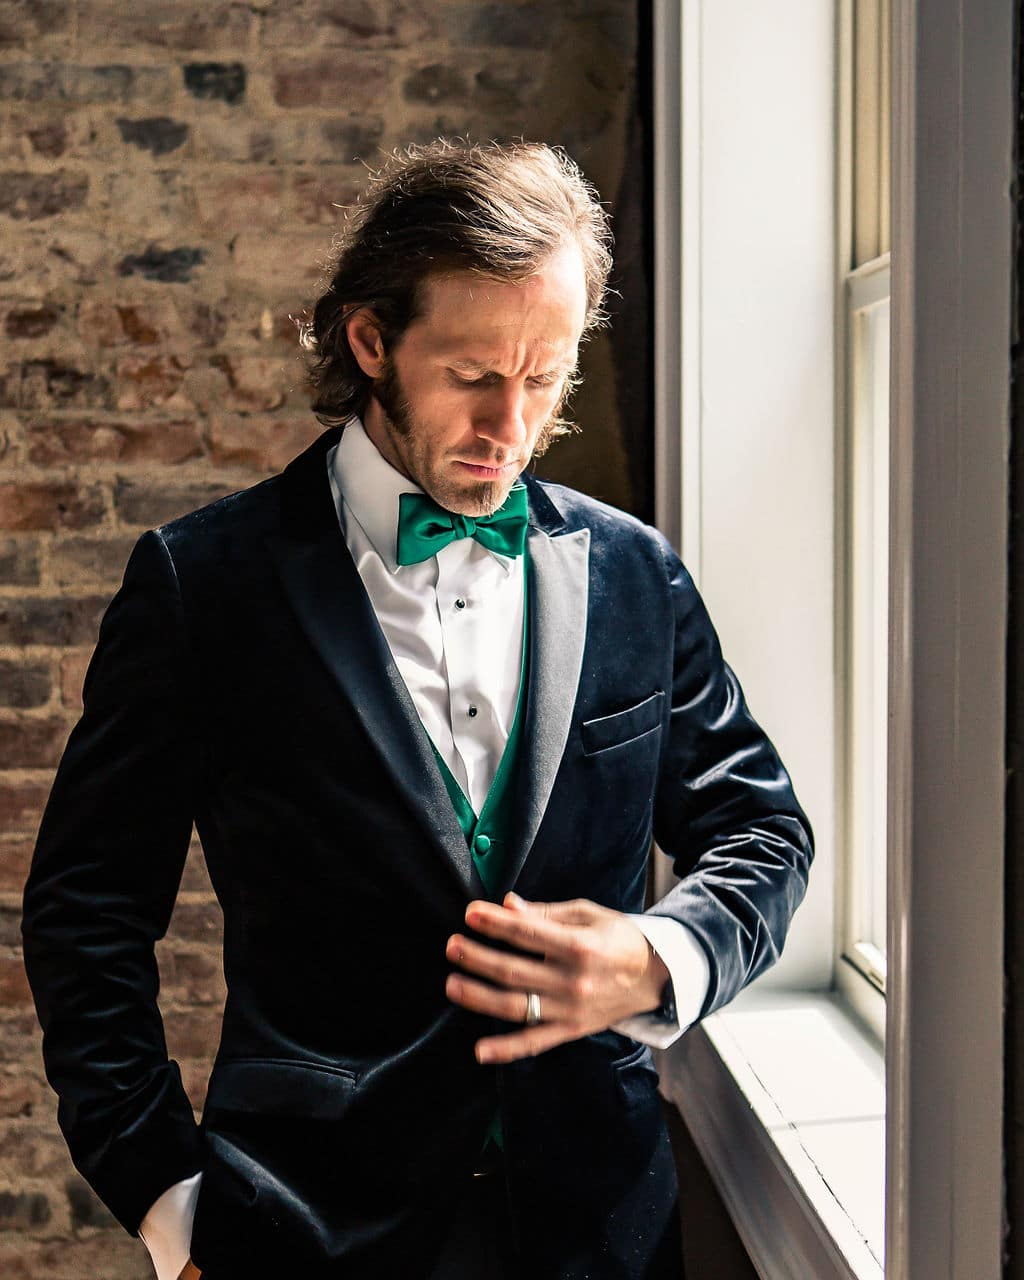 Modern green wedding tuxedo: Travel Inspired Photo Shoot